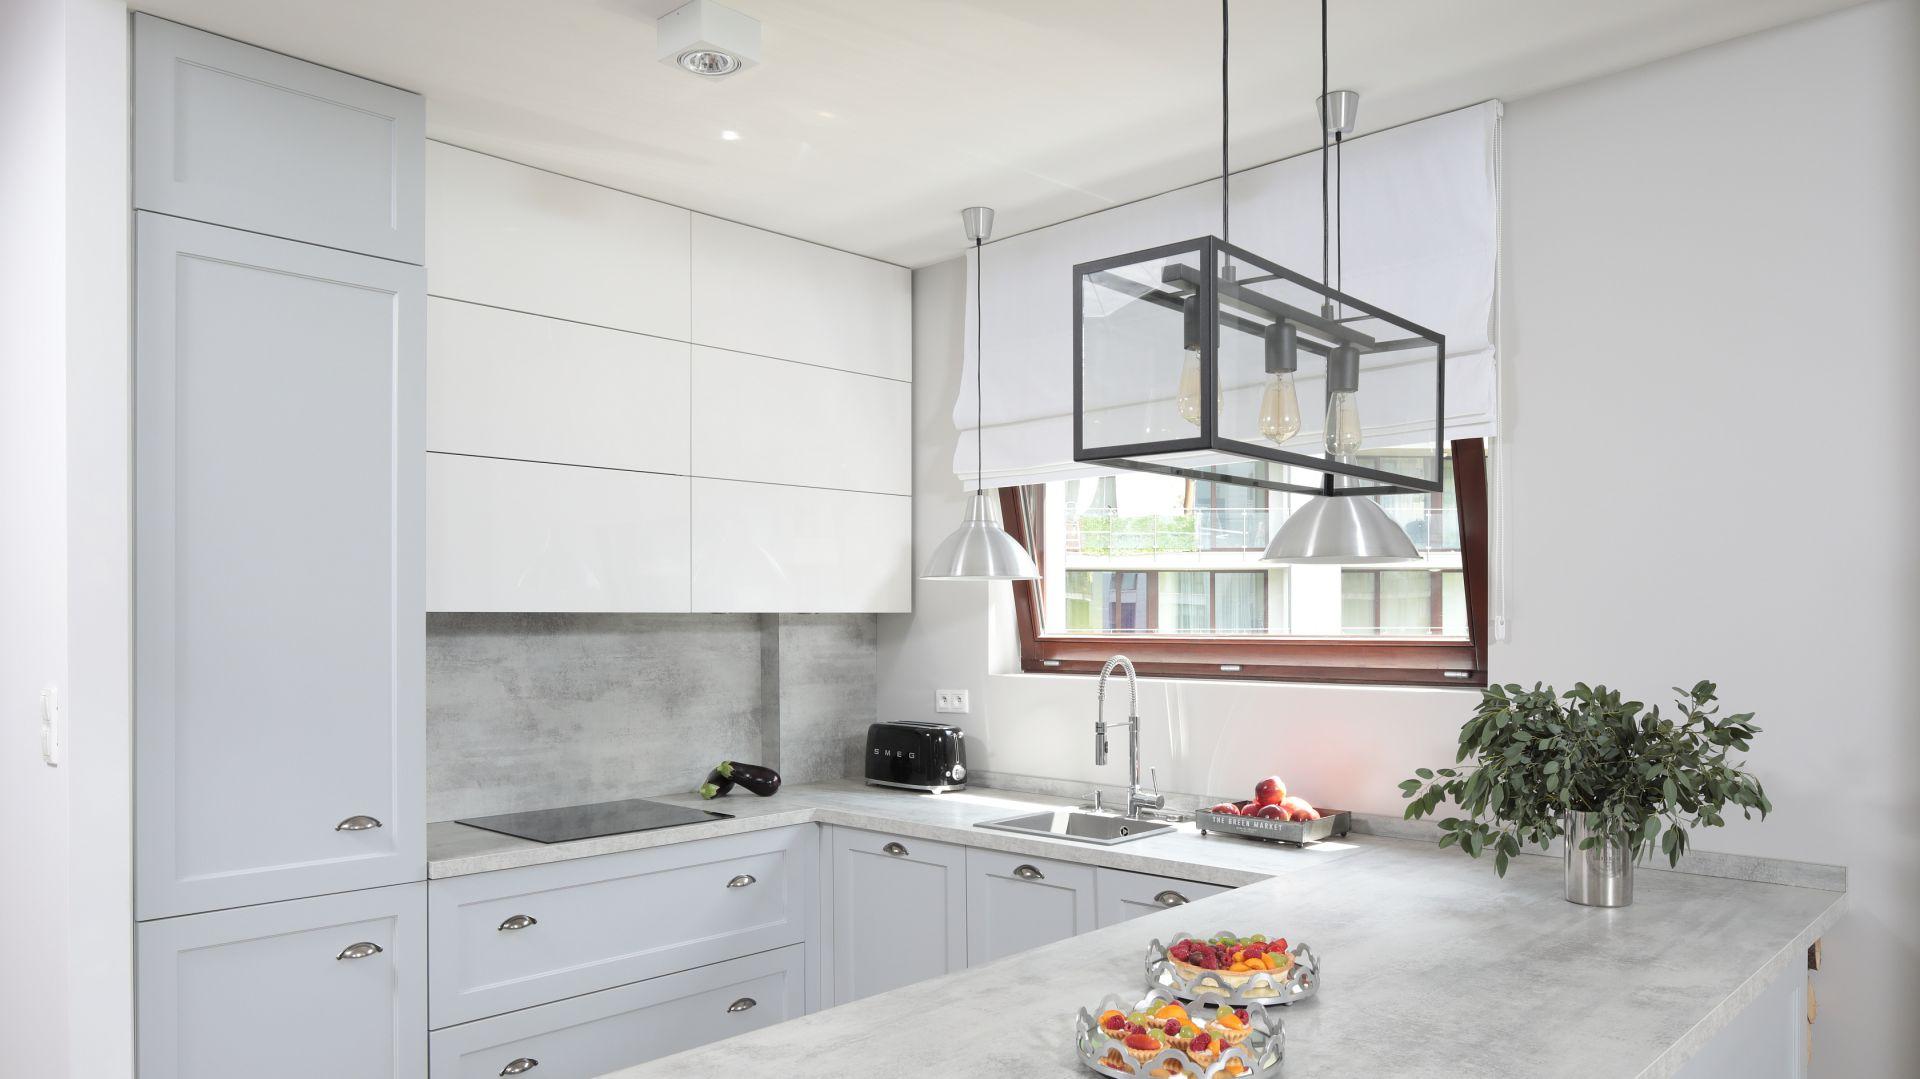 Ściana nad blatem w kuchni. Projekt: Wioleta Wójcik-Maciuszek, Konrad Maciuszek. Fot. Bartosz Jarosz